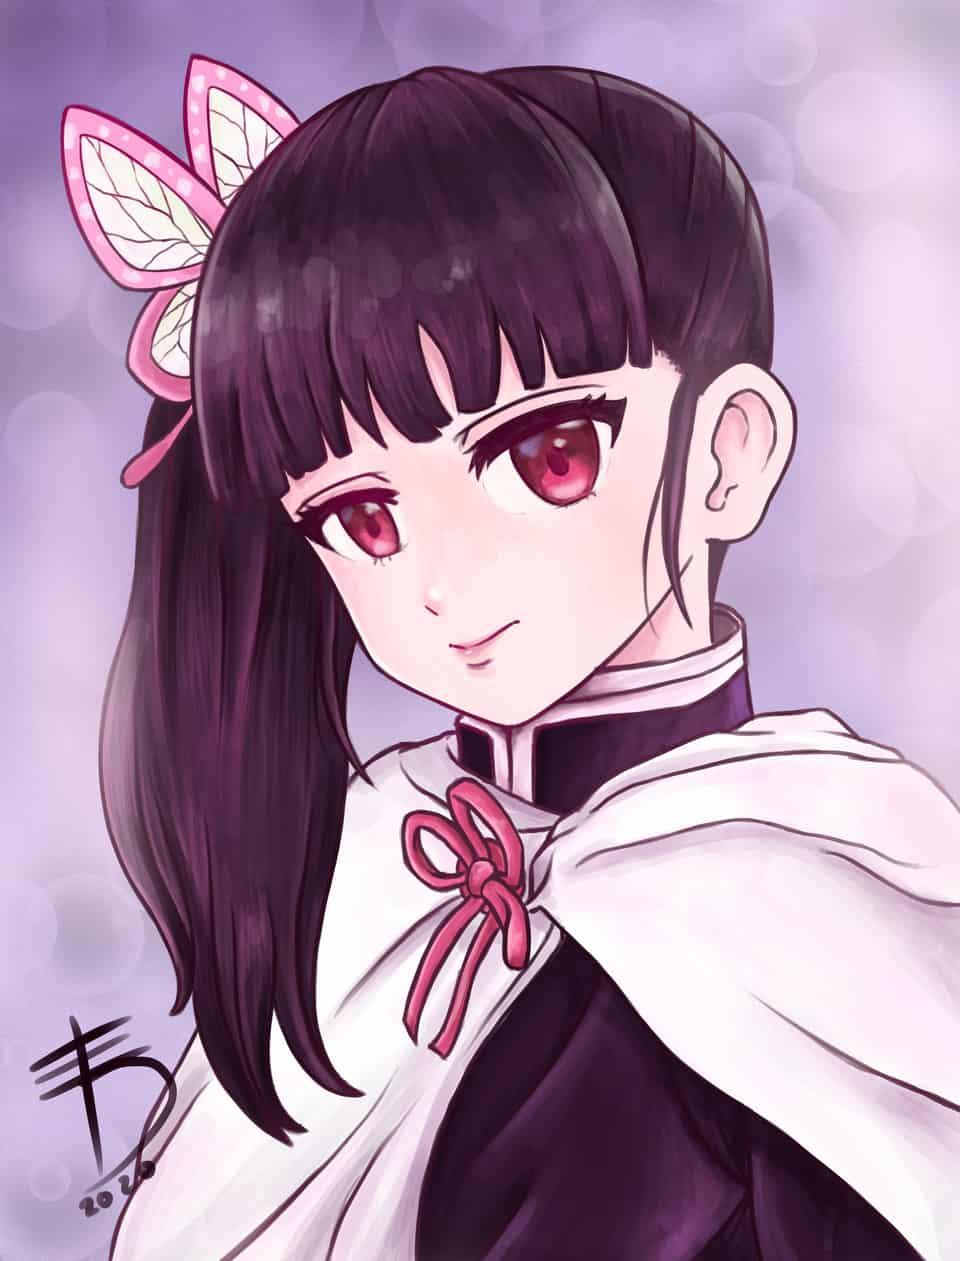 Kanao Tsuyuri 🦋 Illust of Derwelt DemonSlayerFanartContest original TsuyuriKanao anime eyes medibang cute character KimetsunoYaiba kawaii medibangpaint